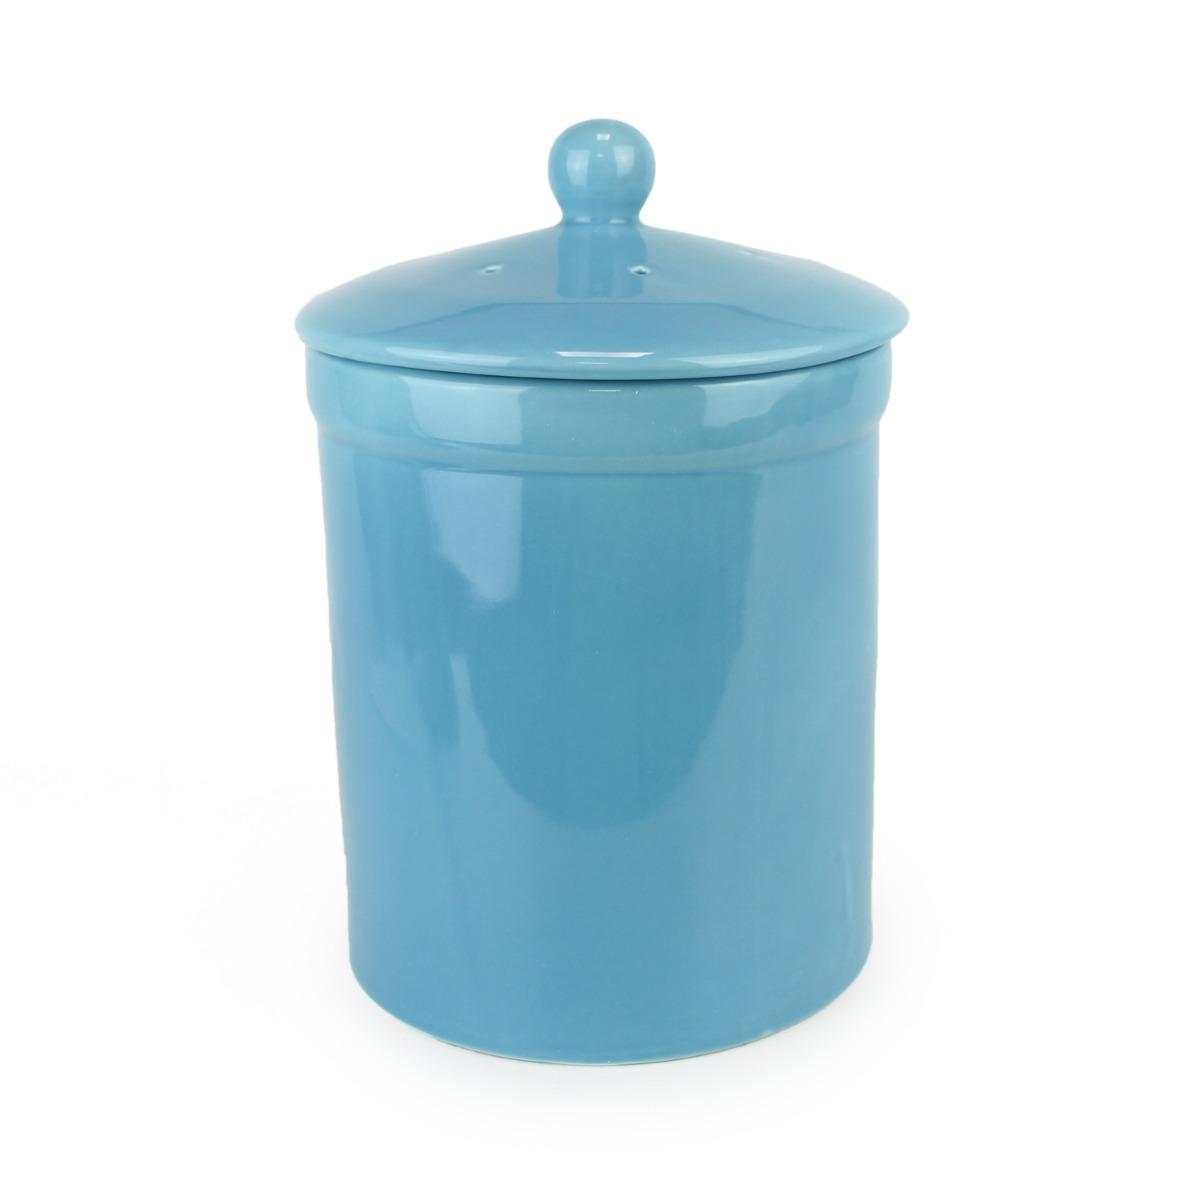 Portland Ceramic Compost Caddy - Teal Blue